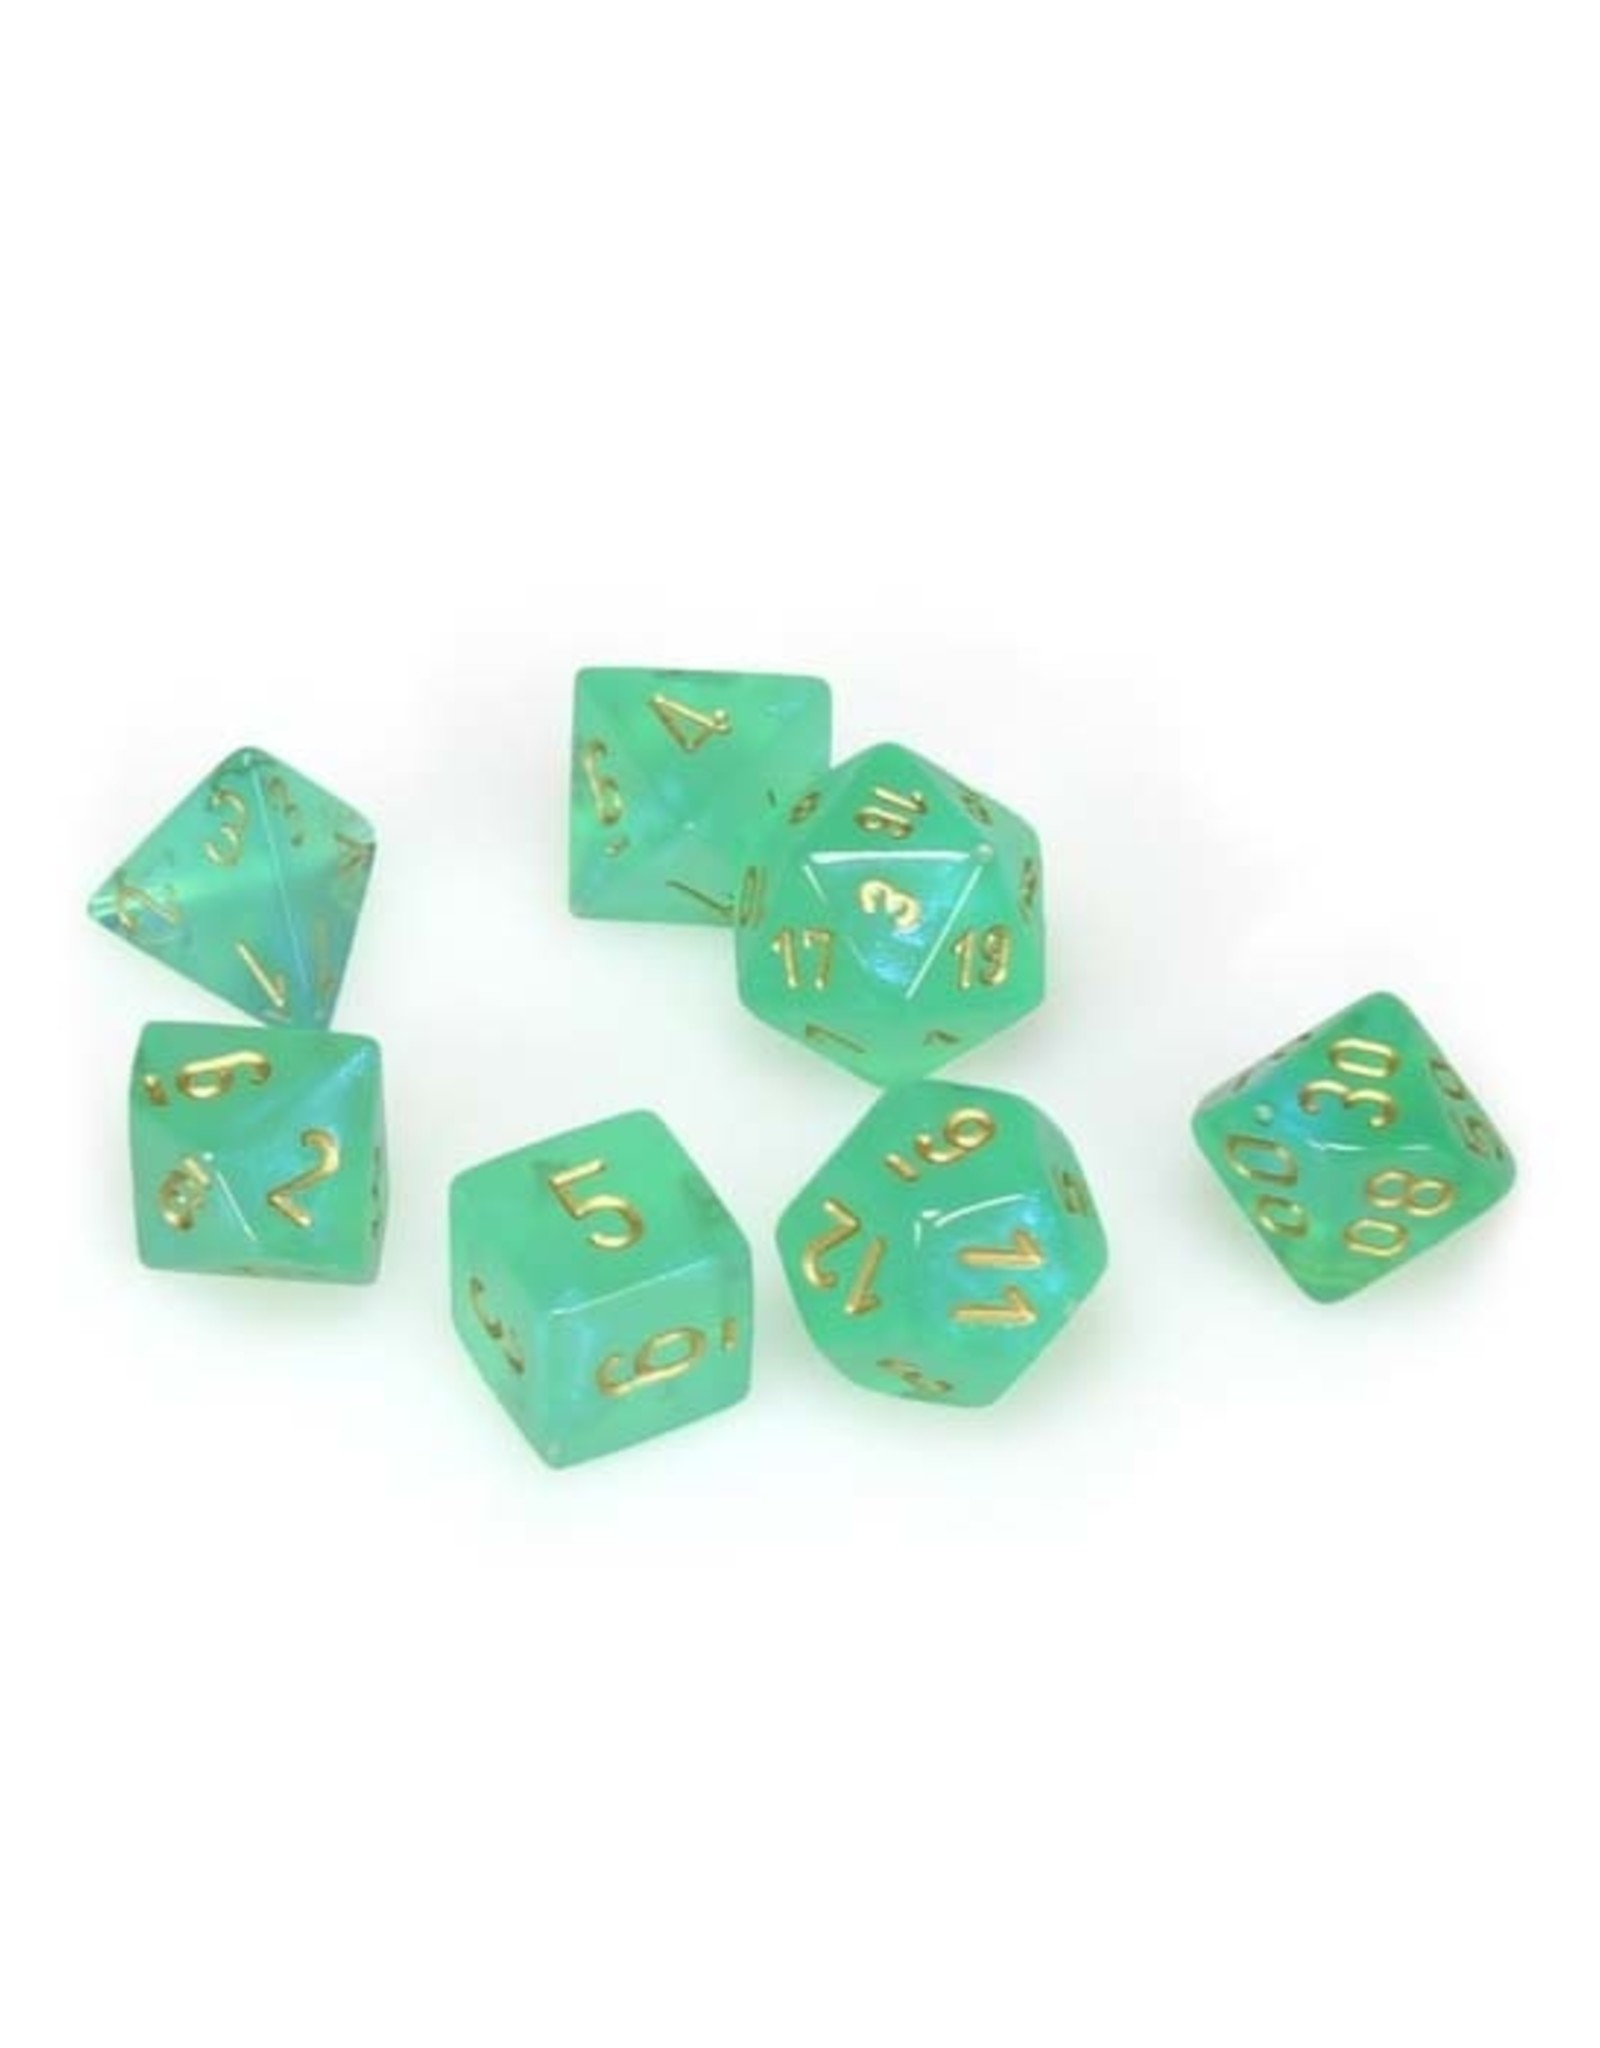 Chessex Chessex: Poly 7 Set - Borealis - Light Green w/ Gold